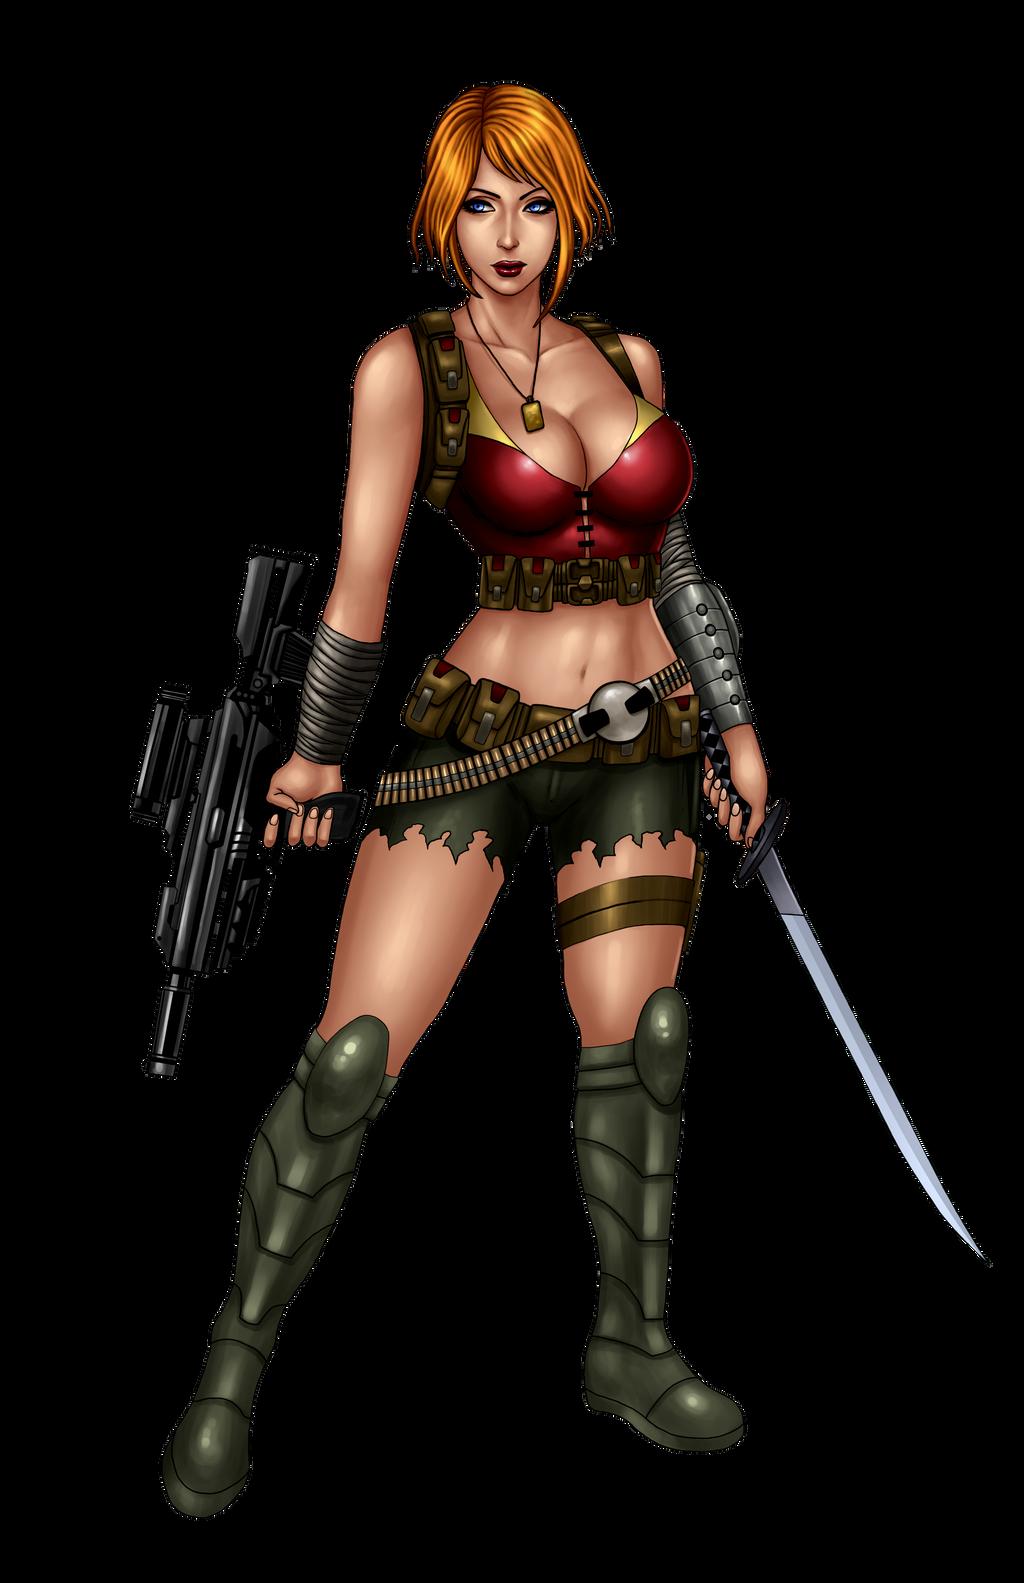 Tomkellyart 170 23 Zombie Slayer Slots Character 1 By Johnbecaro